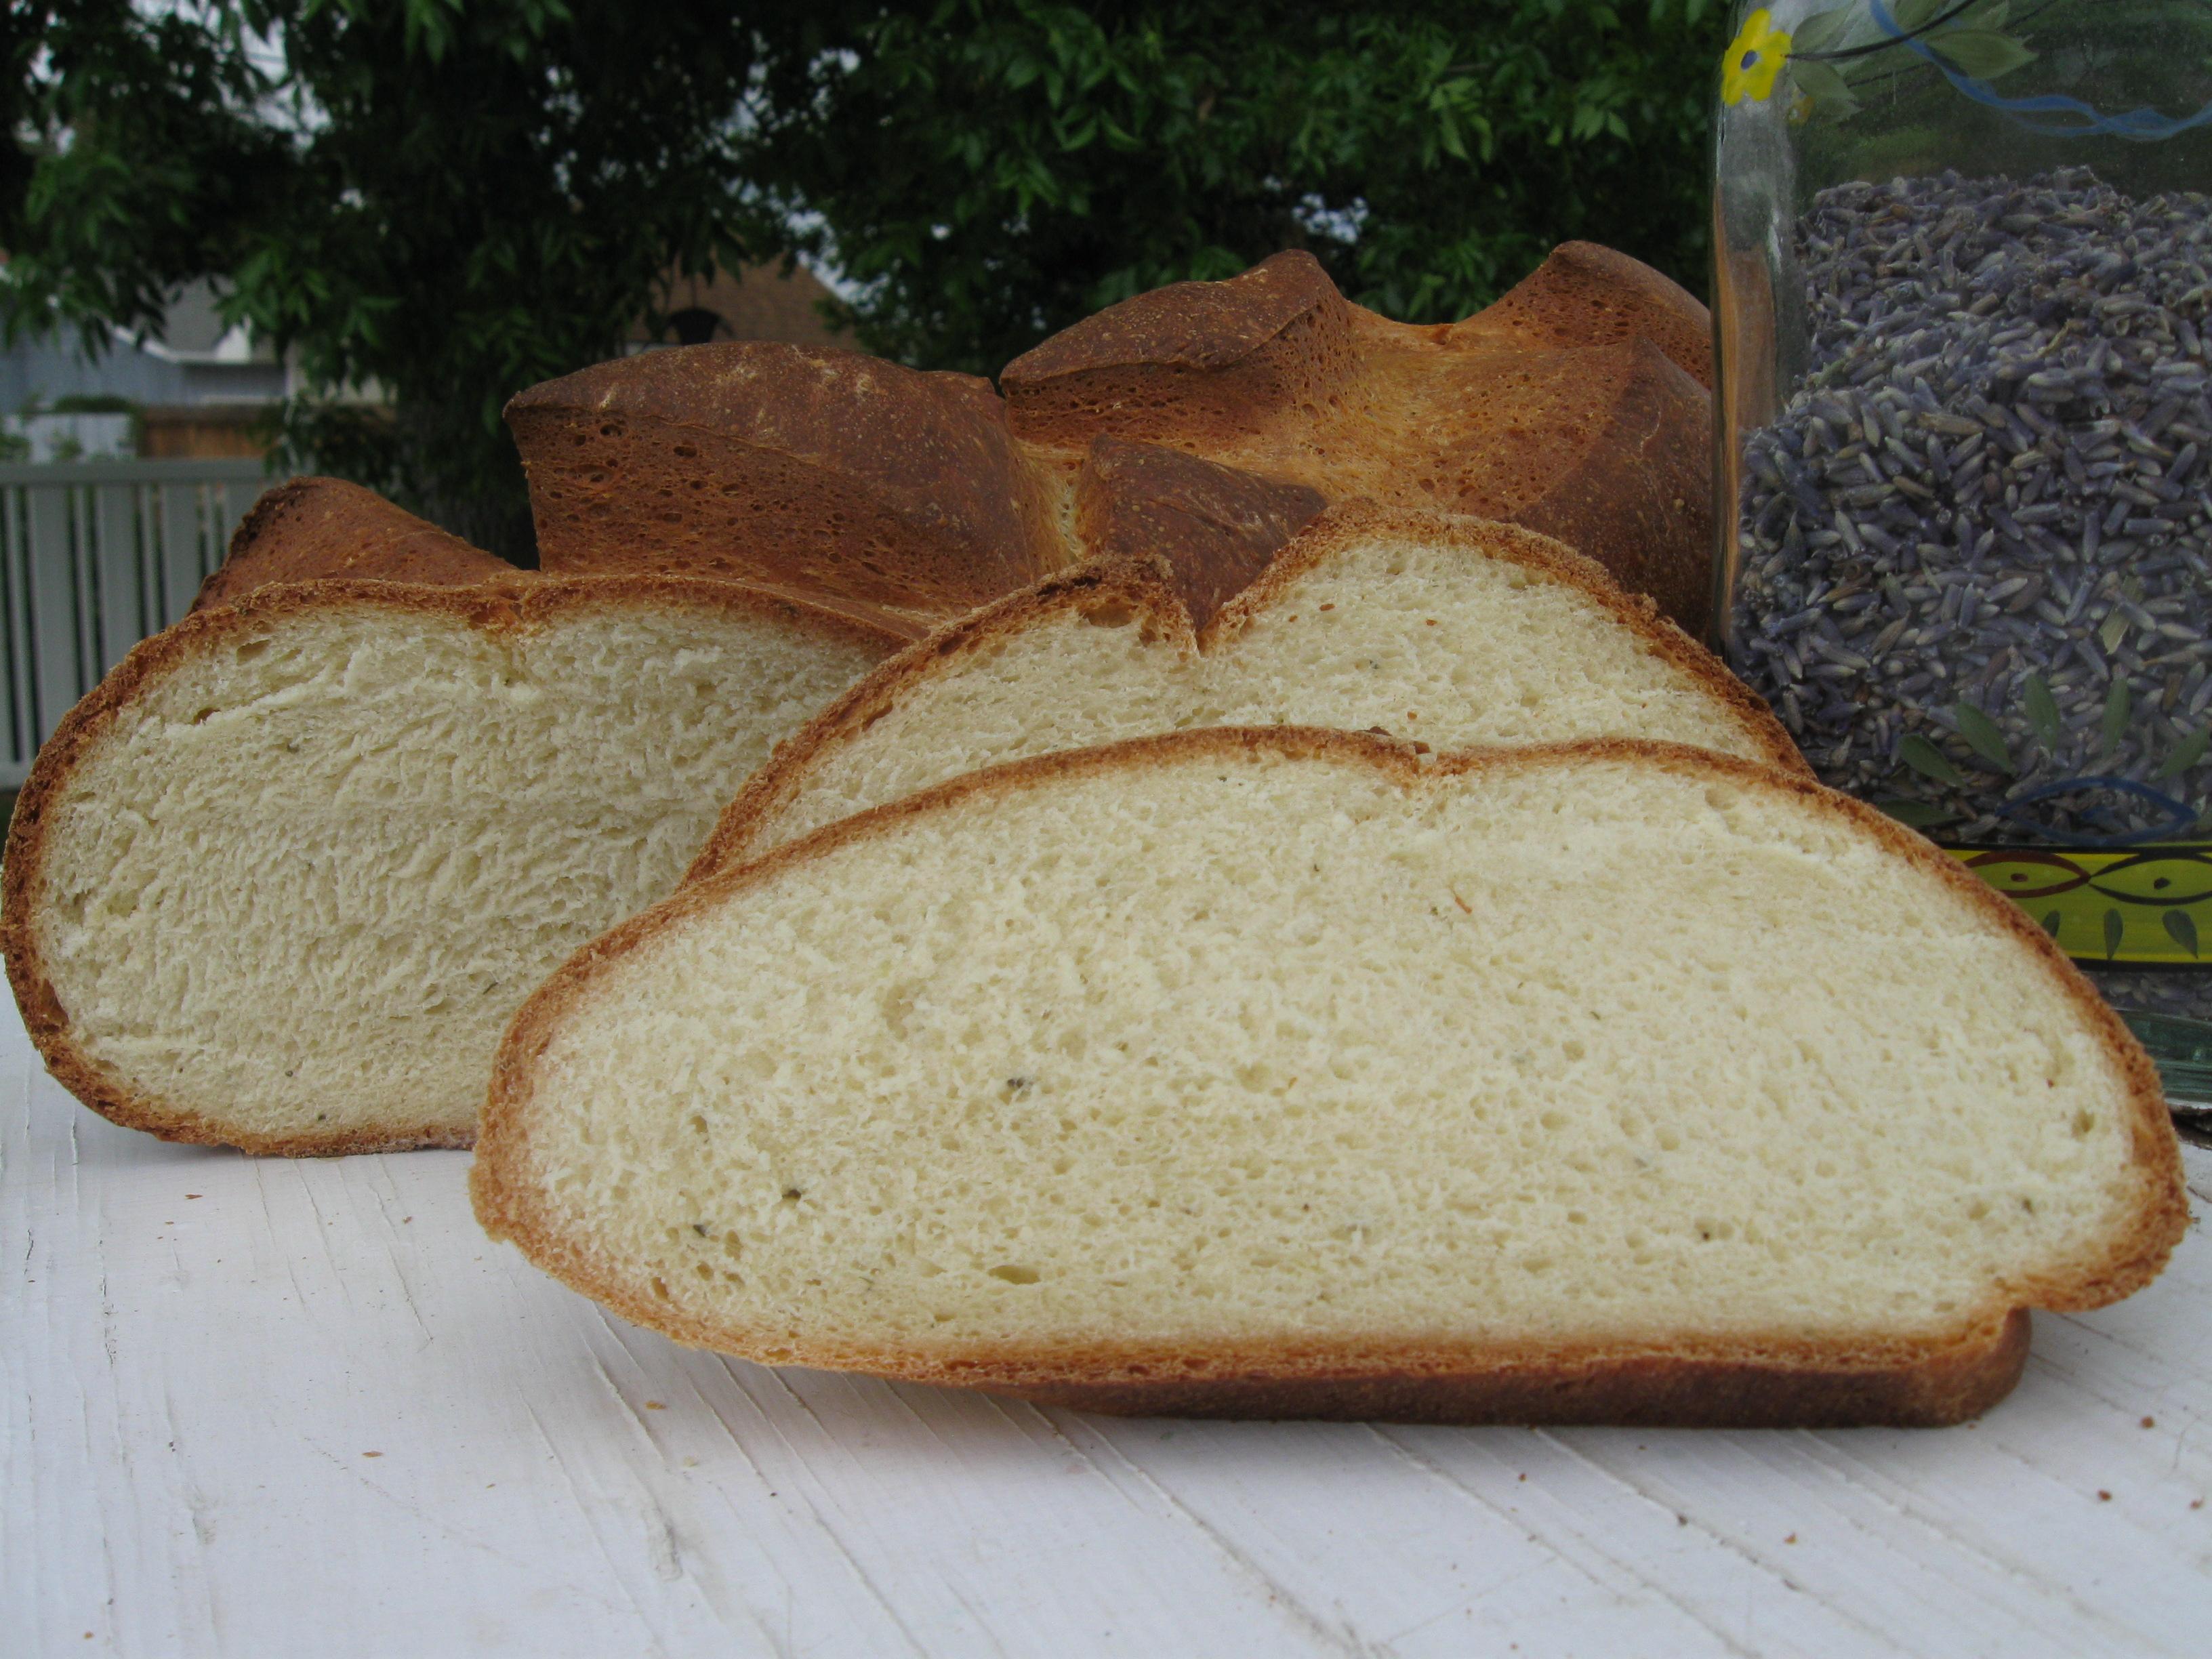 Lavender-Thyme Bread